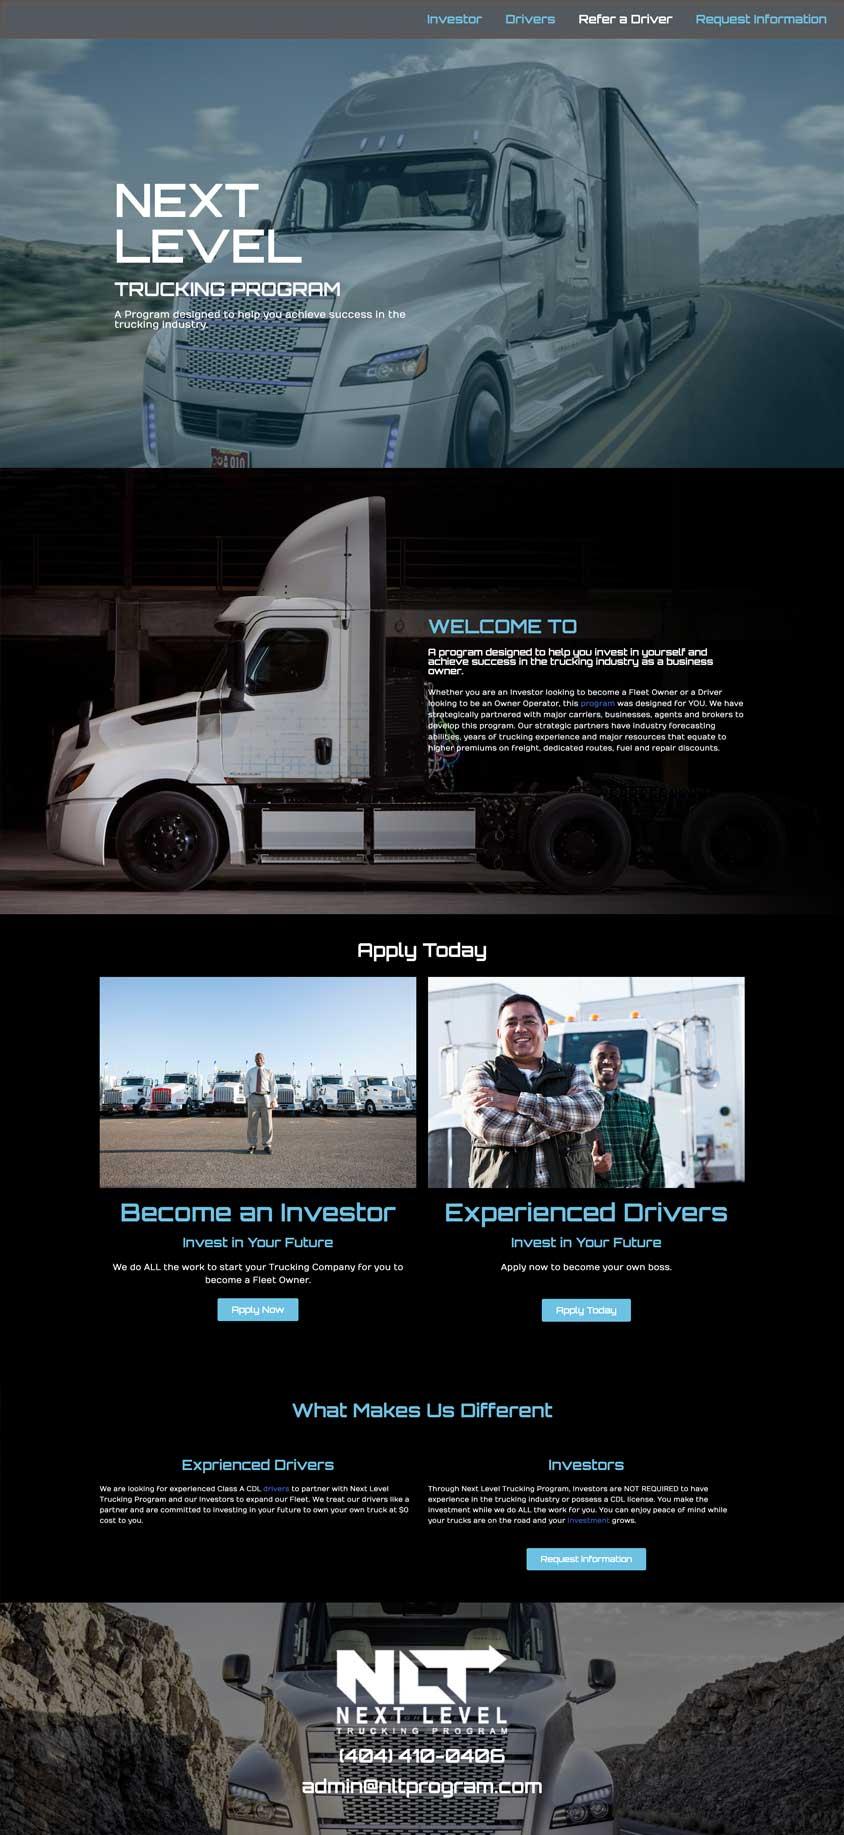 Next Level Trucking Program